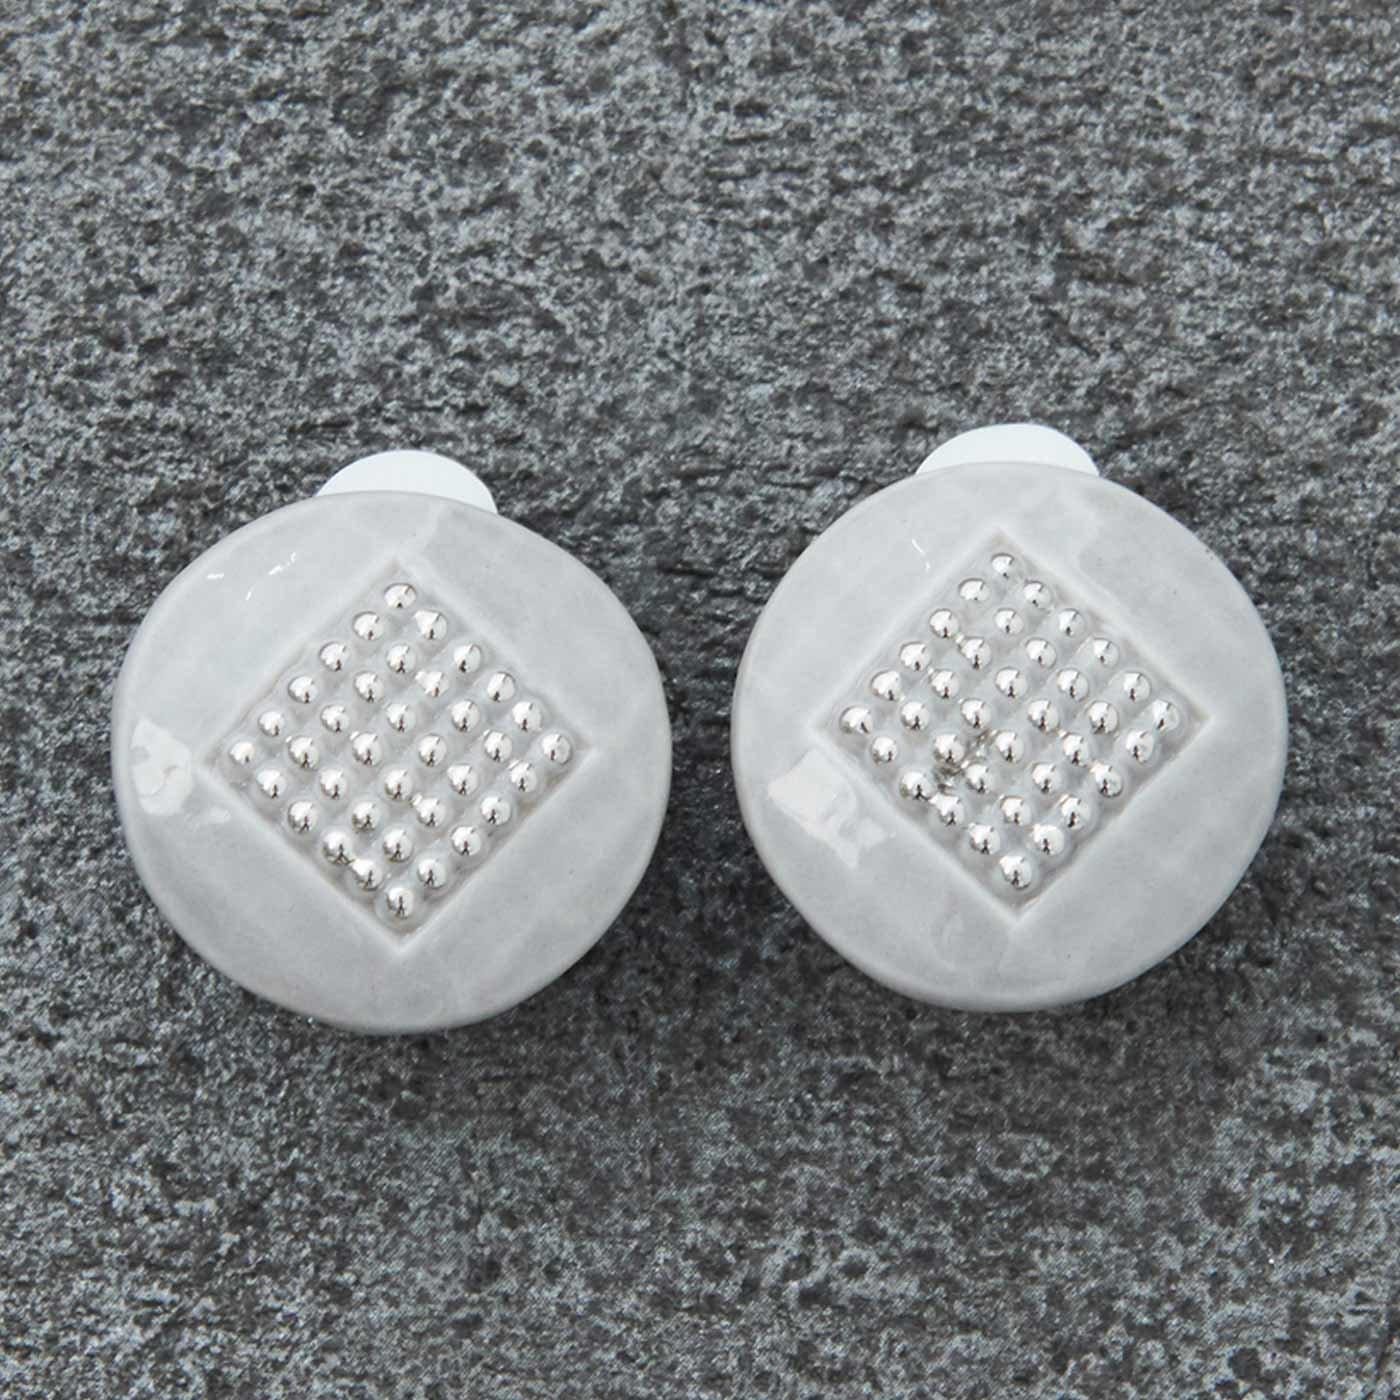 YPAC for MEDE19F フランス製陶器ボタンイヤリング type.01